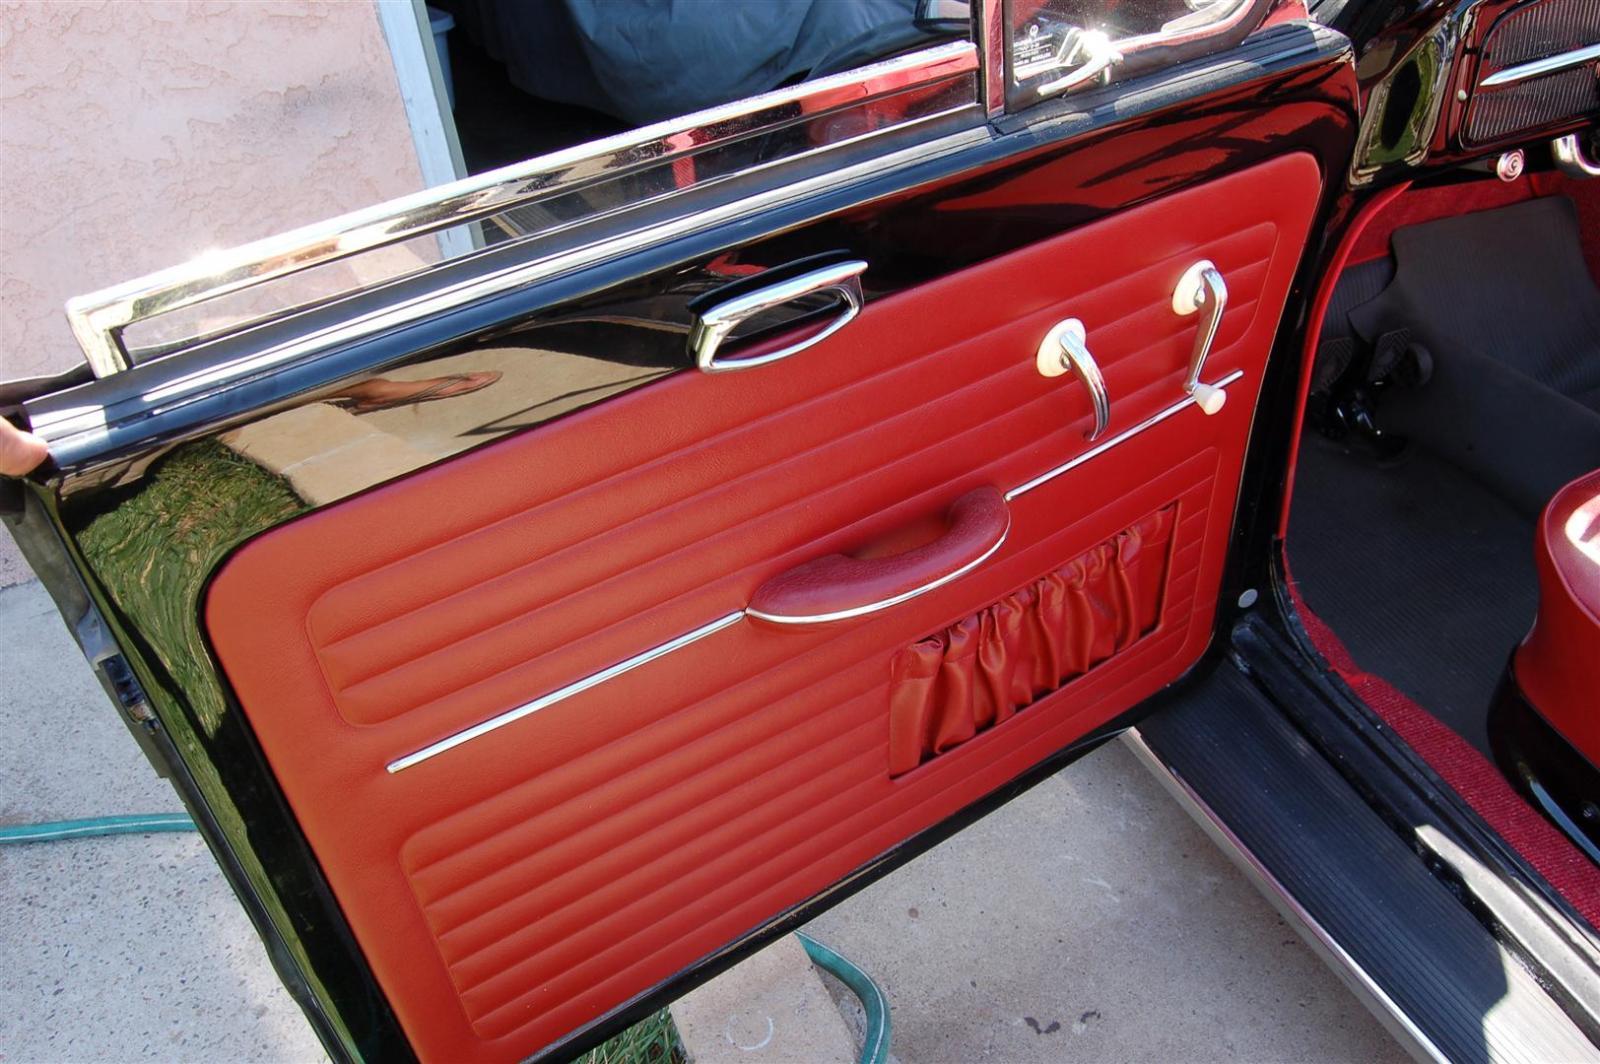 67 72 Chevy Truck Forum >> TheSamba.com :: Beetle - 1958-1967 - View topic - 1966 ...